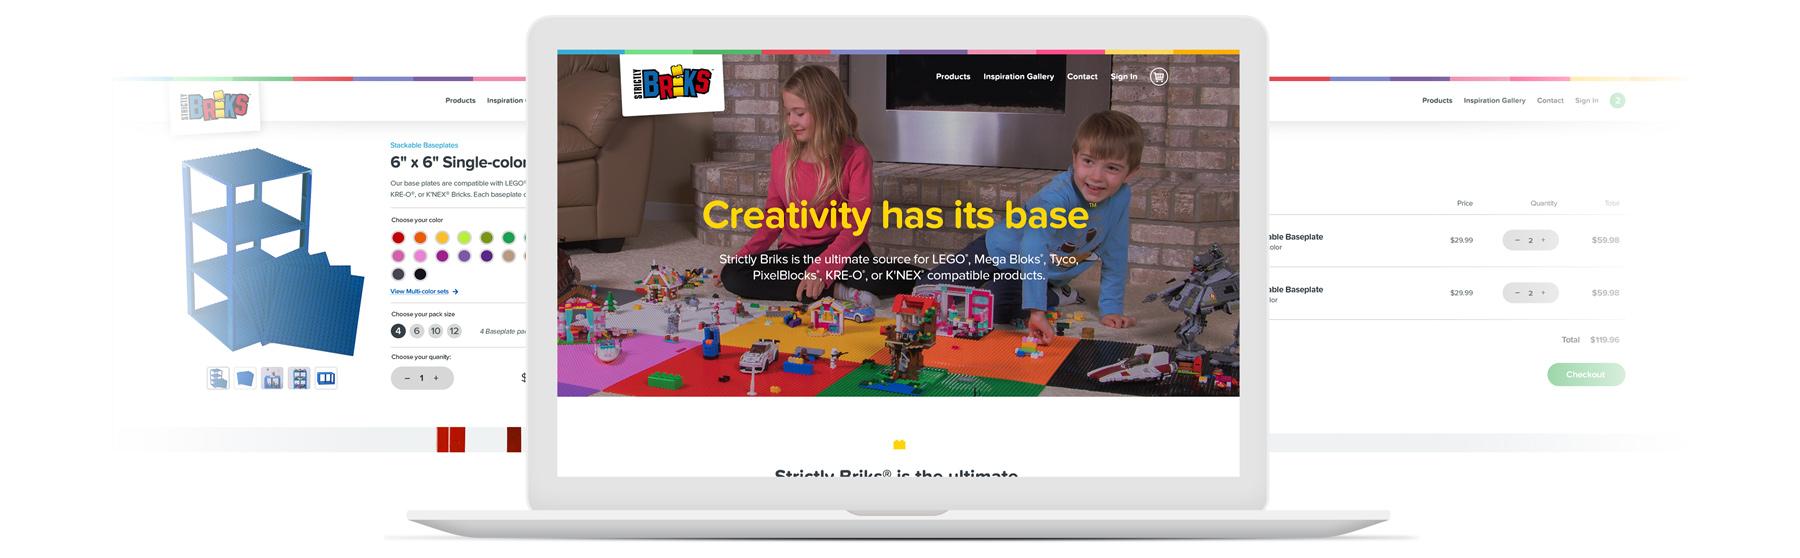 Strictly Briks website homepage on laptop screen